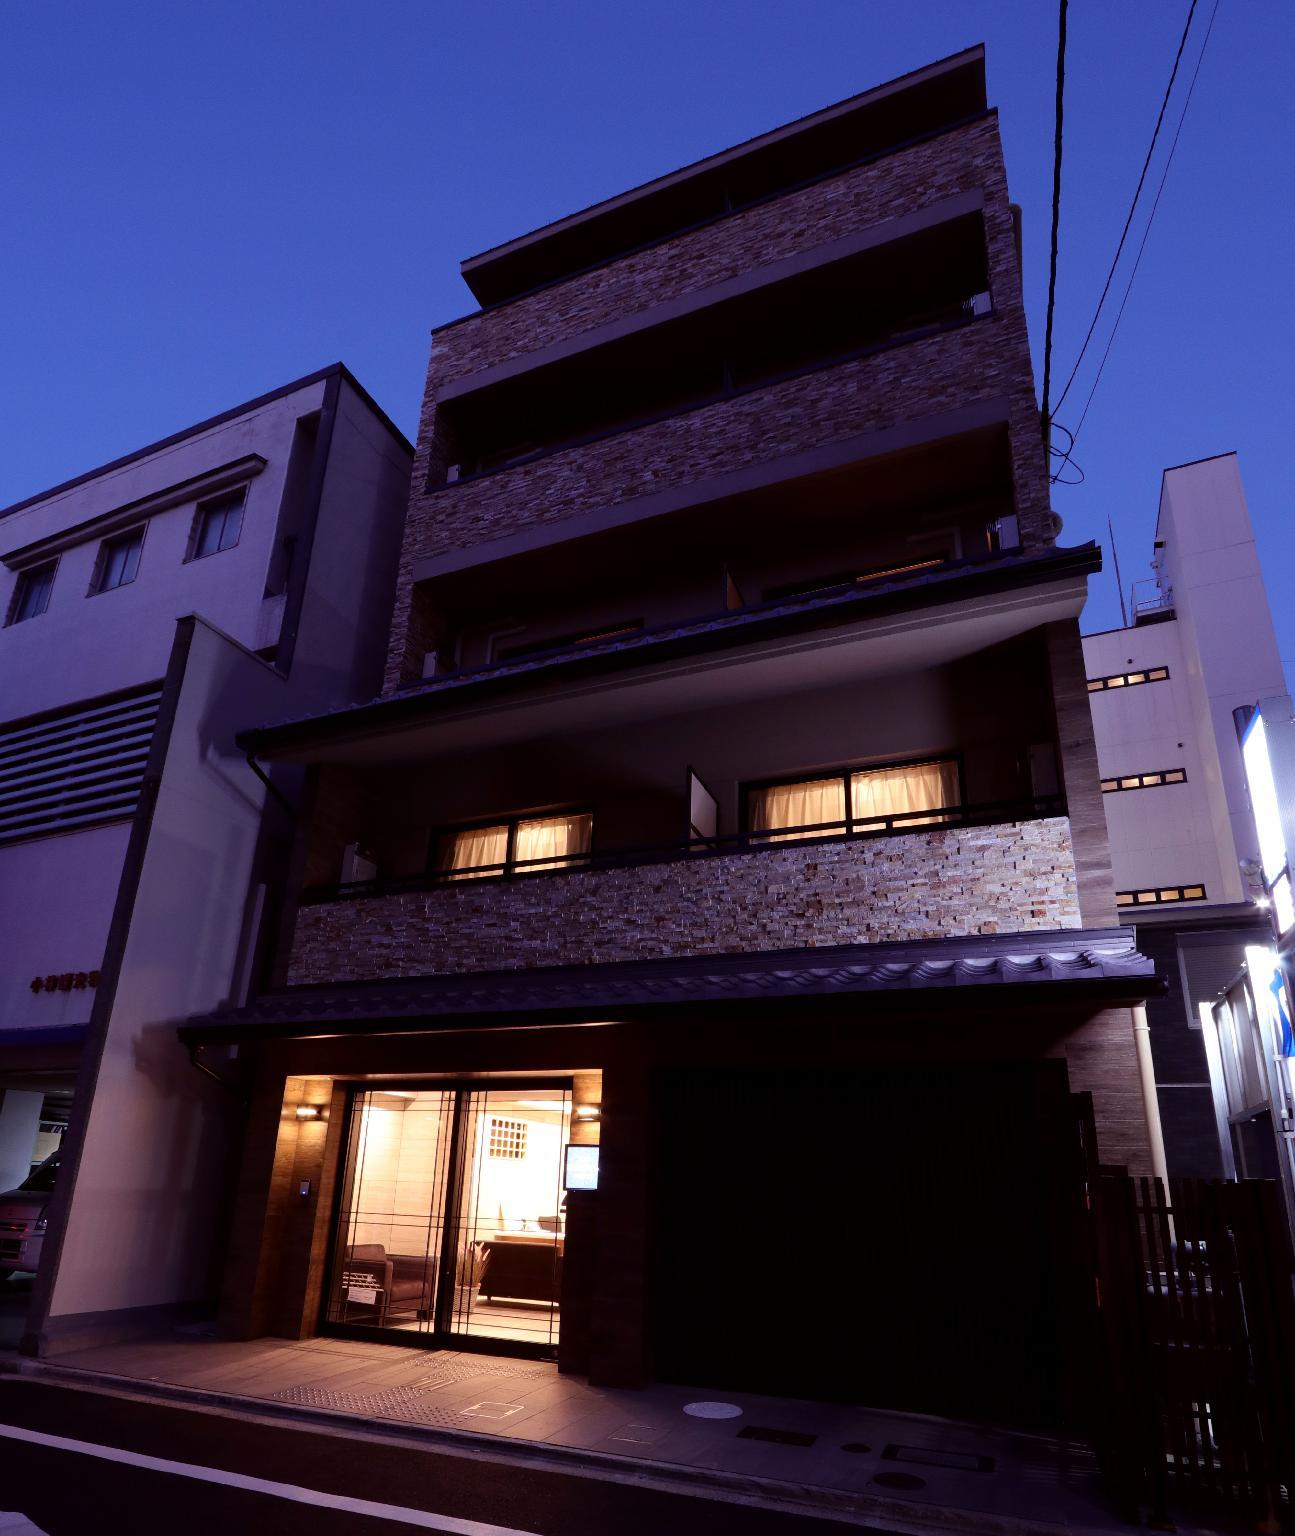 Kyoto Teramachi Matsubara Hotel Grandereverie